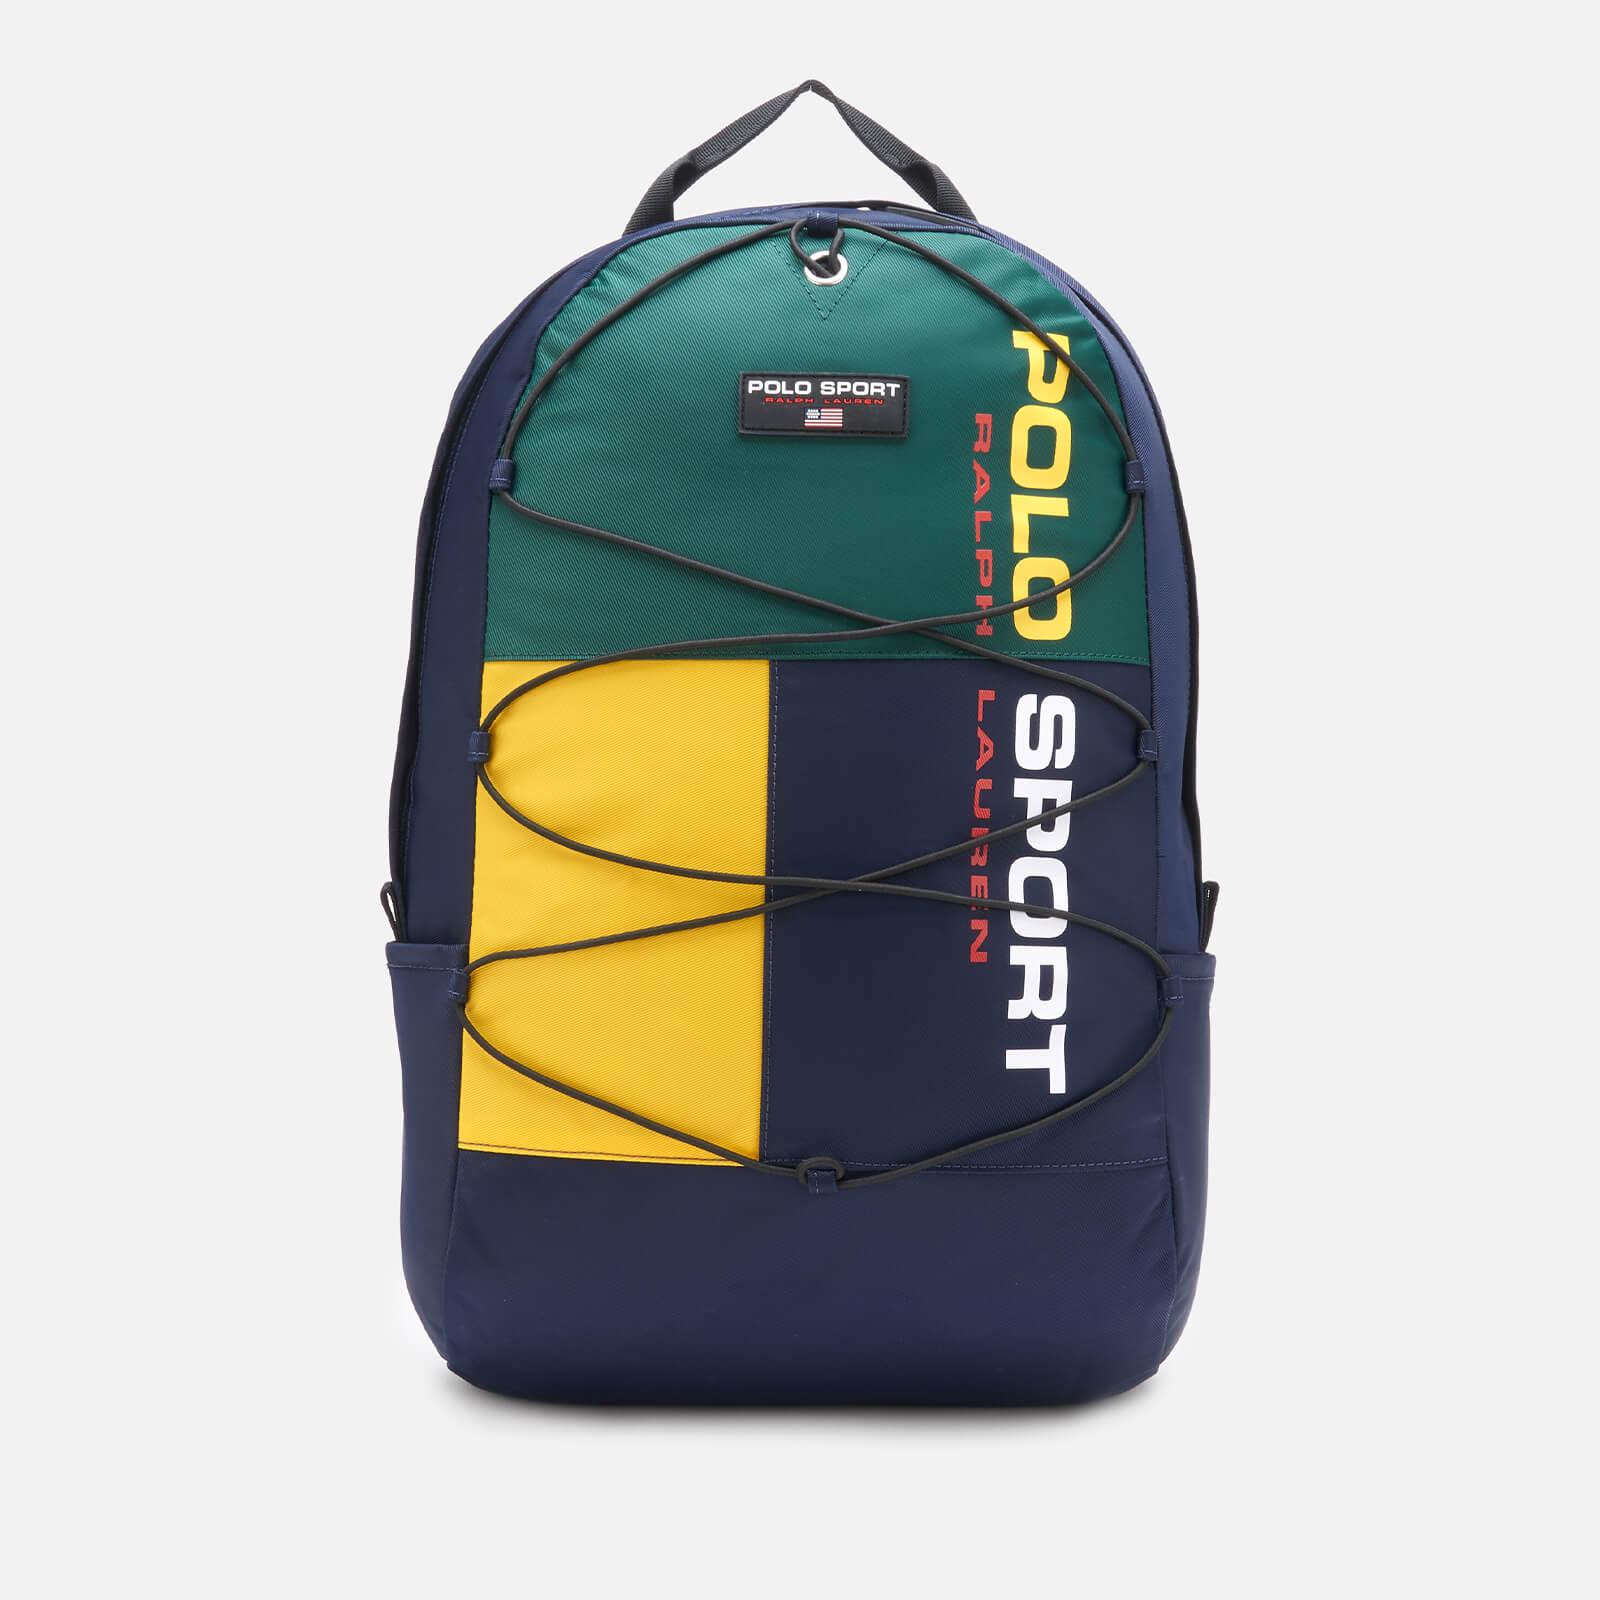 Ralph Lauren Polo Ralph Lauren Men's Polo Sport Backpack - Navy/Green/Yellow